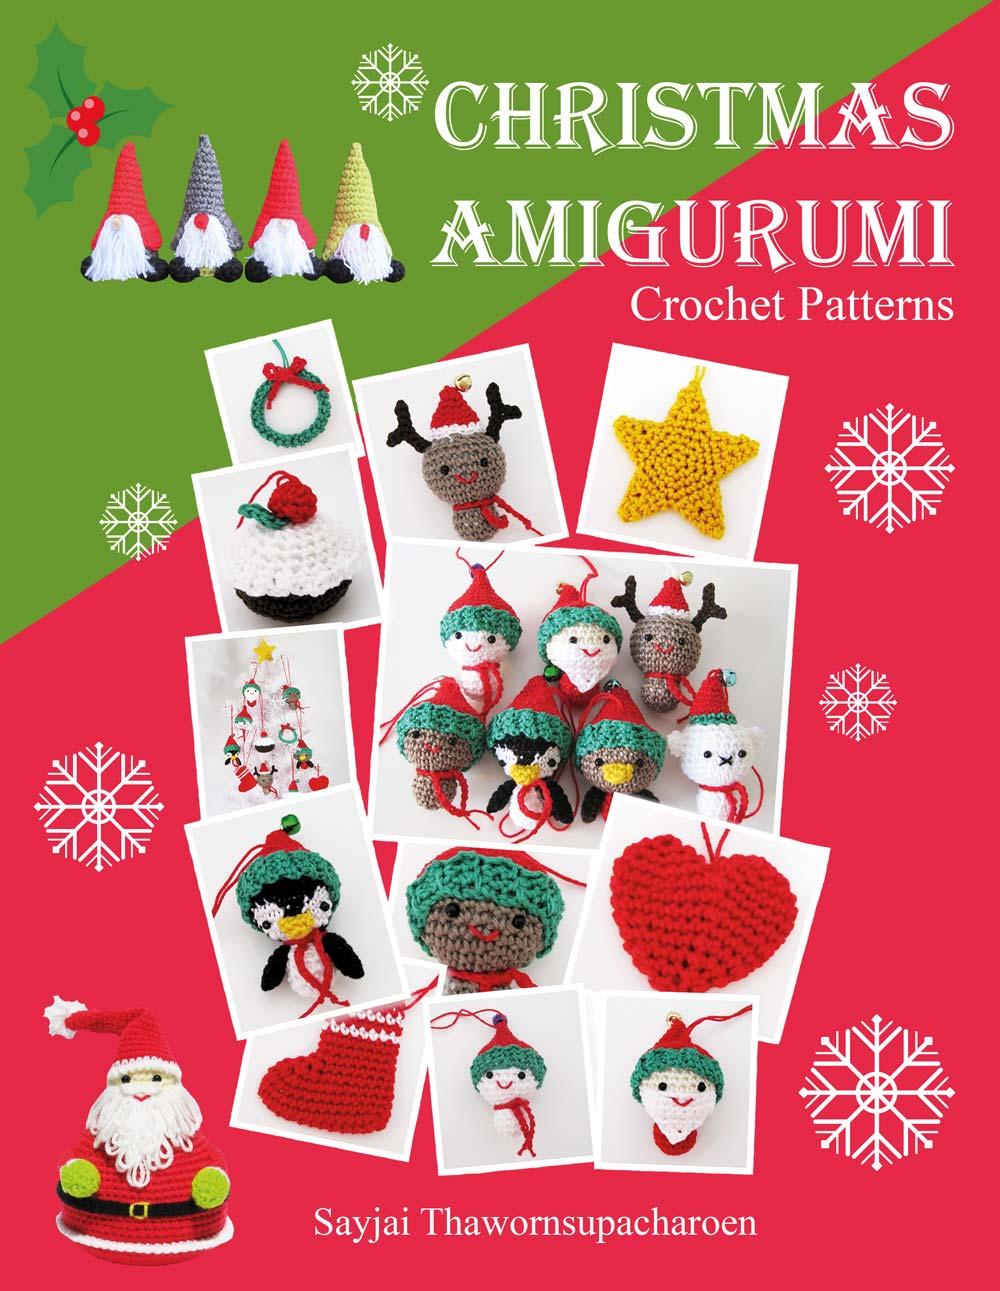 A new Christmas Amigurumi Crochet Patterns Book - Sayjai Amigurumi ...